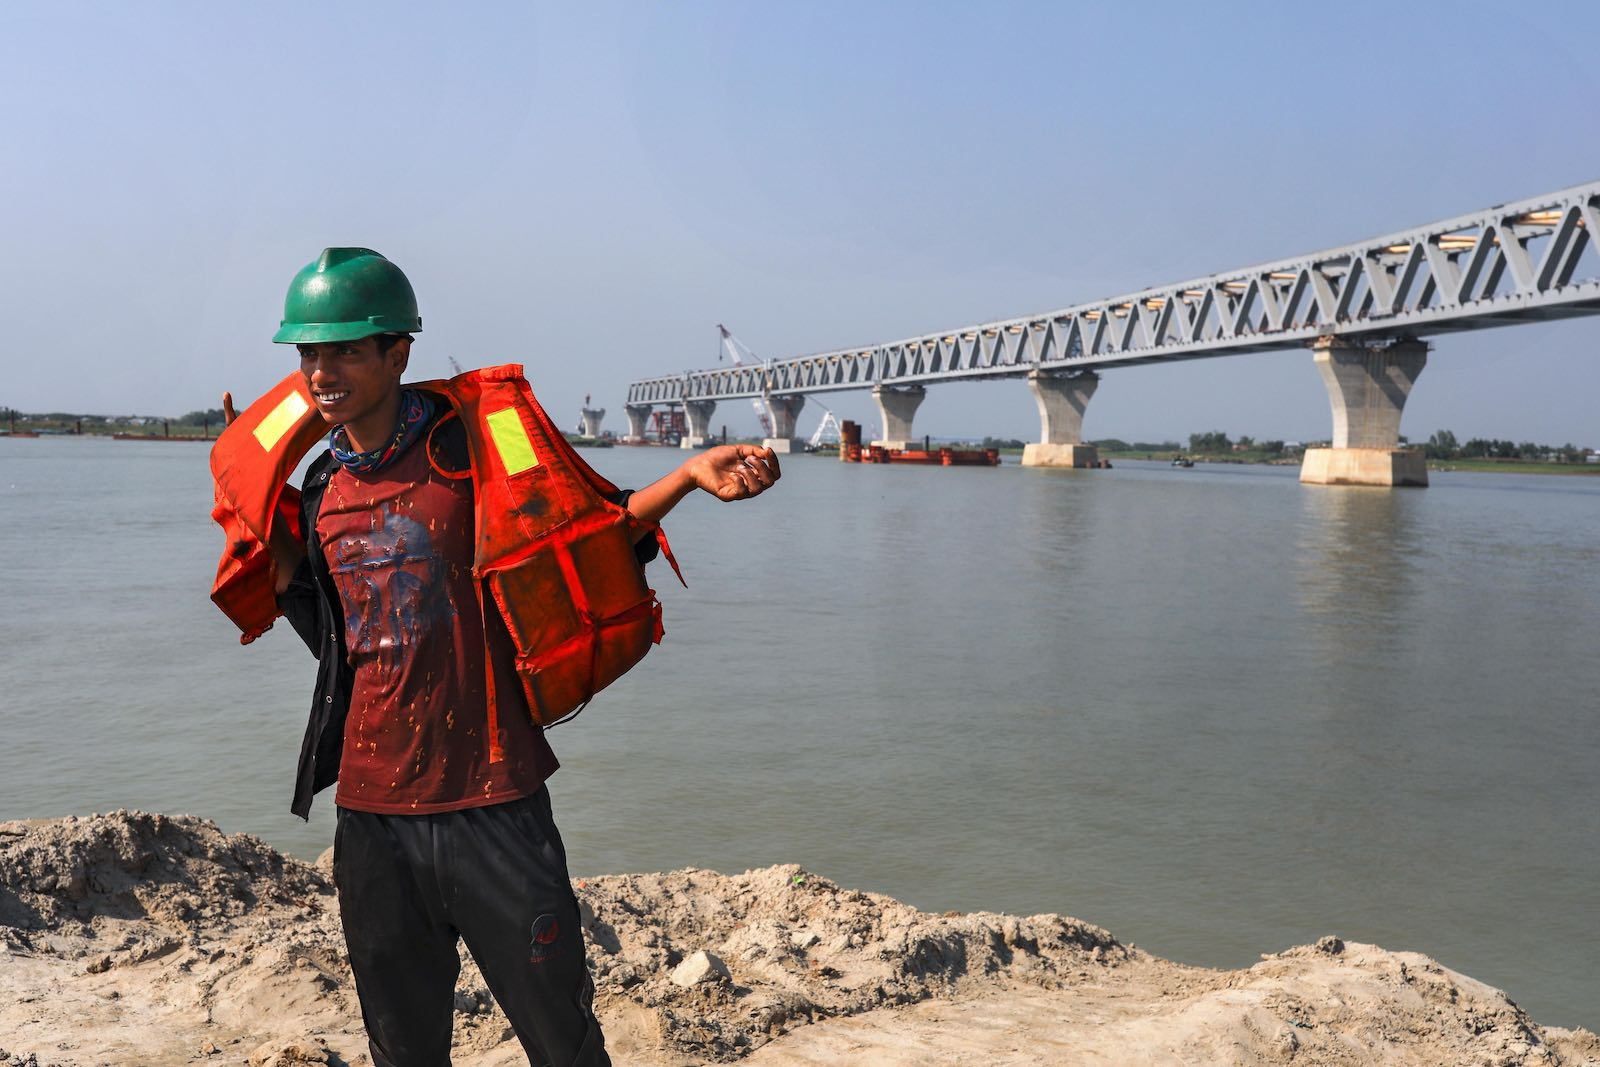 Padma Bridge project, a 6.15-kilometre bridge that will connect the south-west of Bangladesh to the northern and eastern regions (Photo: Kazi Salahuddin Razu via Getty)